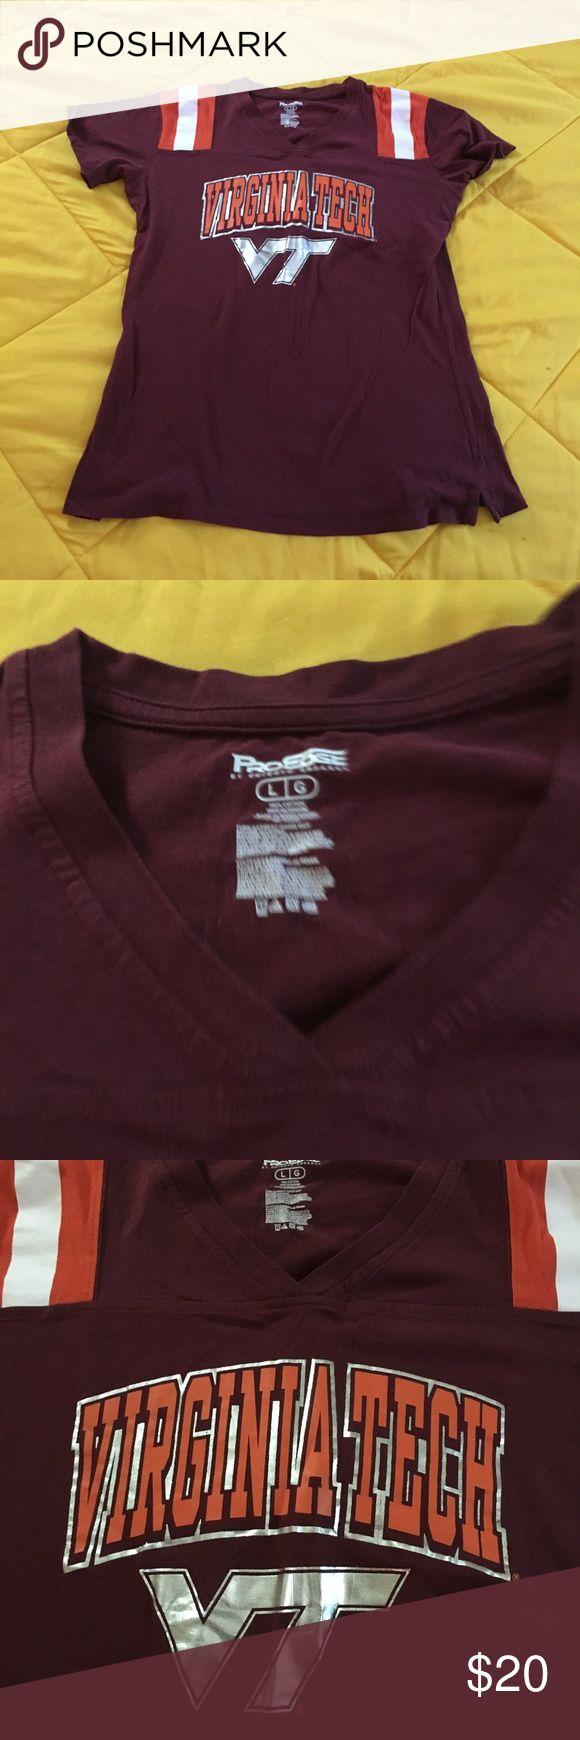 Women's/Juniors Virginia Tech Tshirt  large Women's/juniors Virginia Tech Tshirt. Size large. GUC. Maroon base with silver & orange writing. White & orange stripes on shoulders. Tops Tees - Short Sleeve